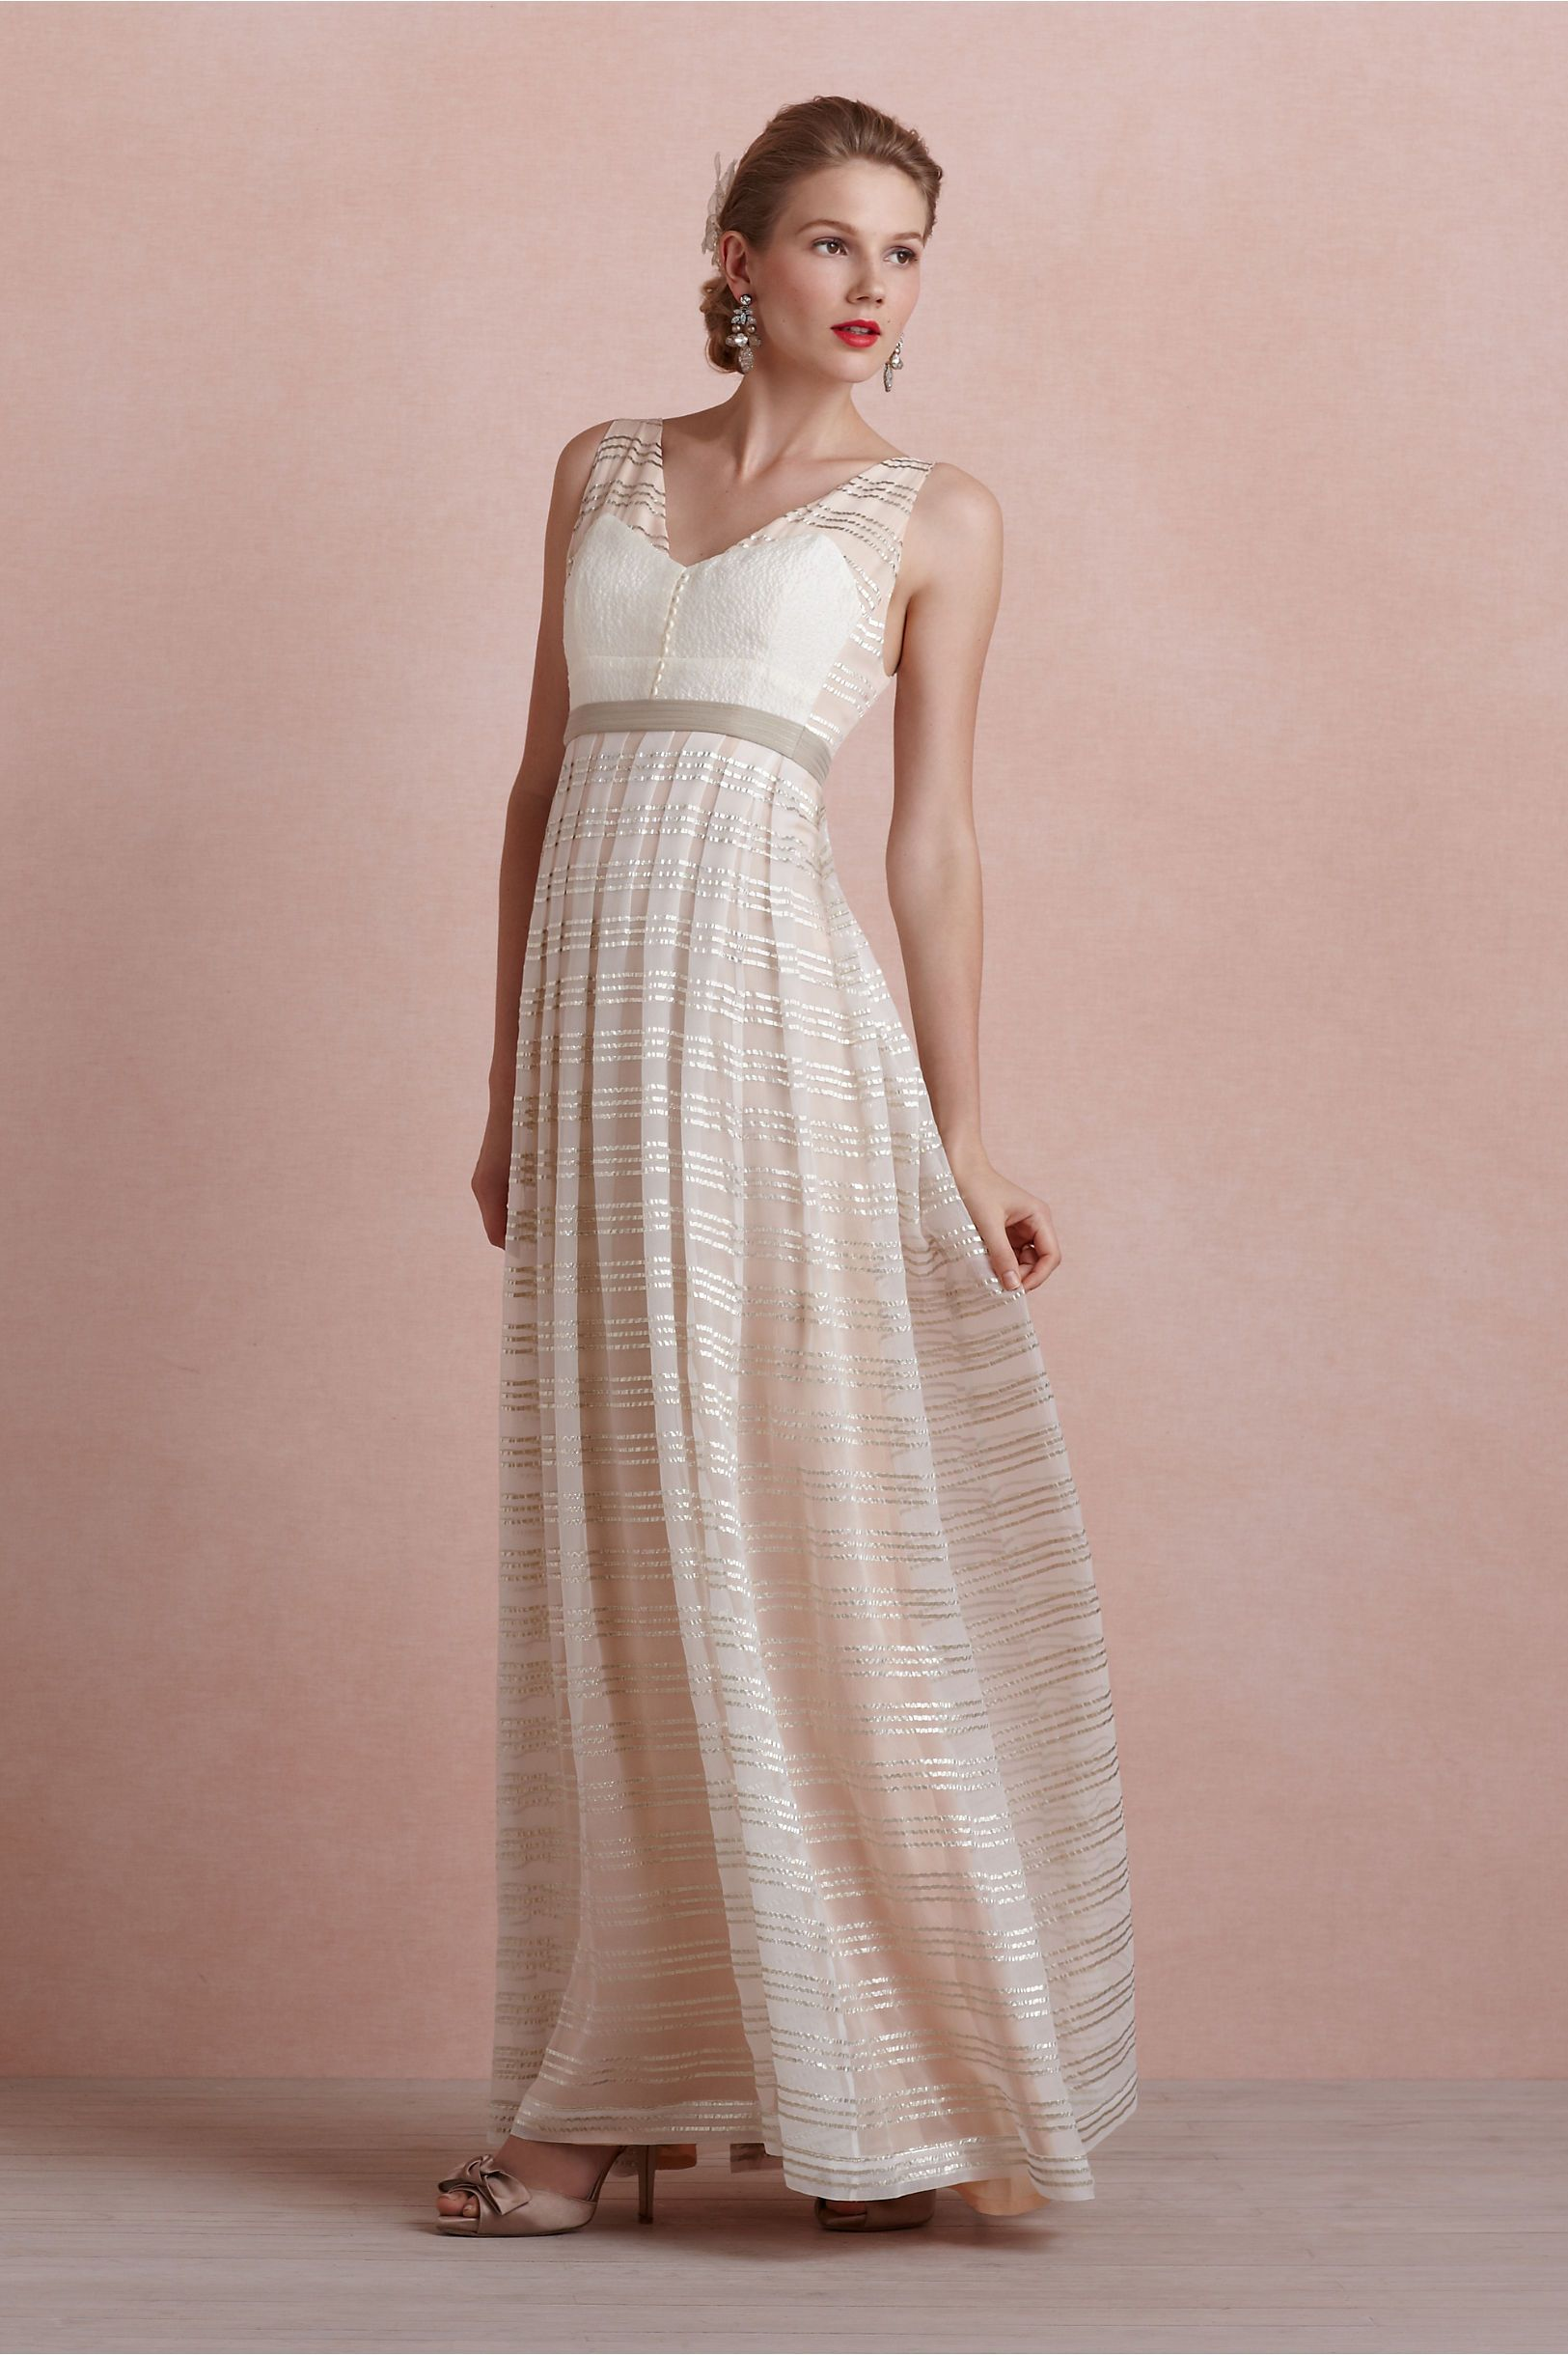 elegant   Blush Golden Strata Dress BHLDN   Wear It Out   Pinterest